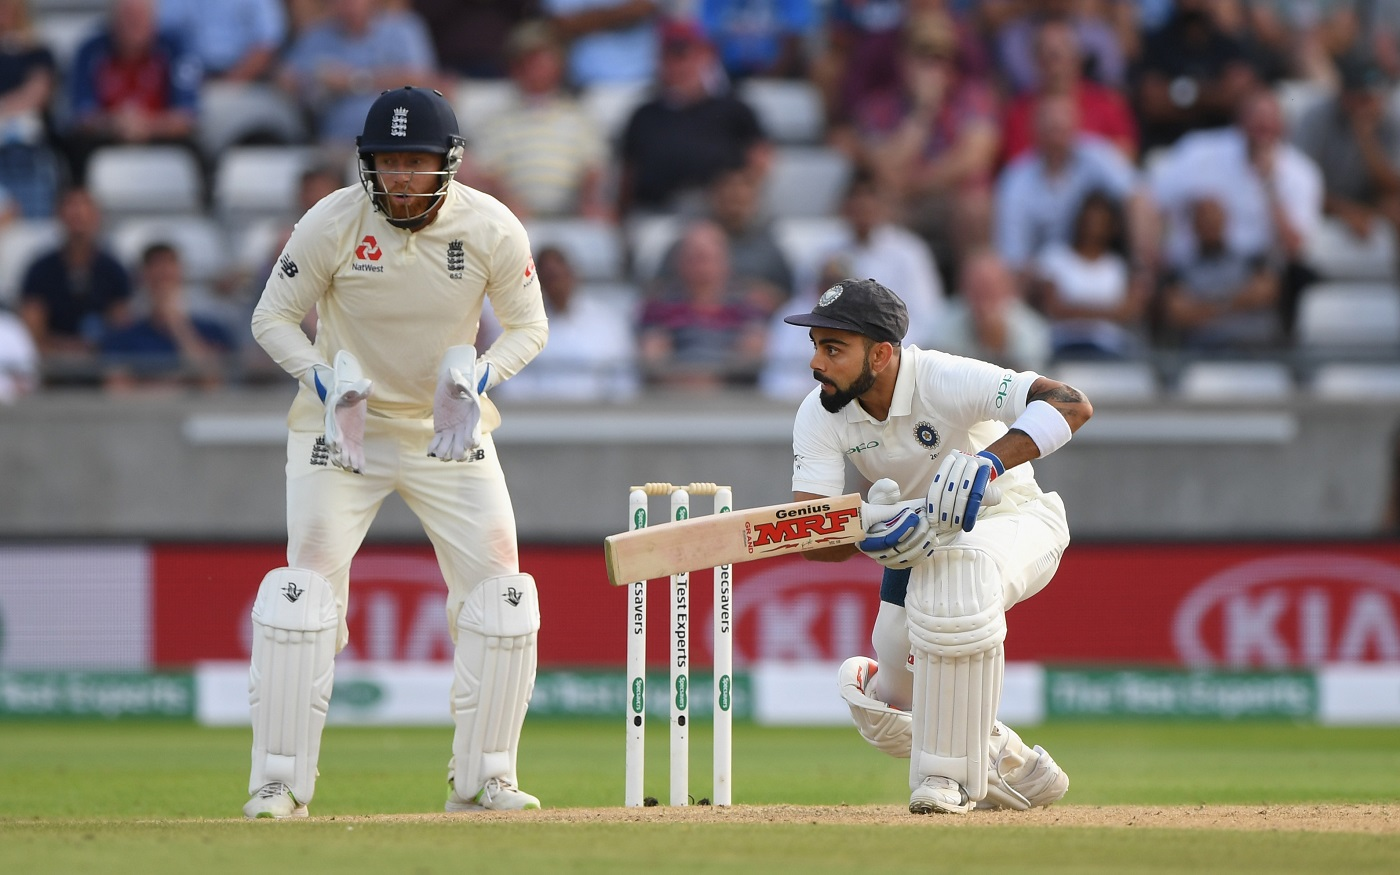 ENG vs IND 2018: Virat Kohli Equals The Likes Of Sachin Tendulkar And Rahul Dravid After Scoring 50-Plus In Both Innings Of Edgbaston Test